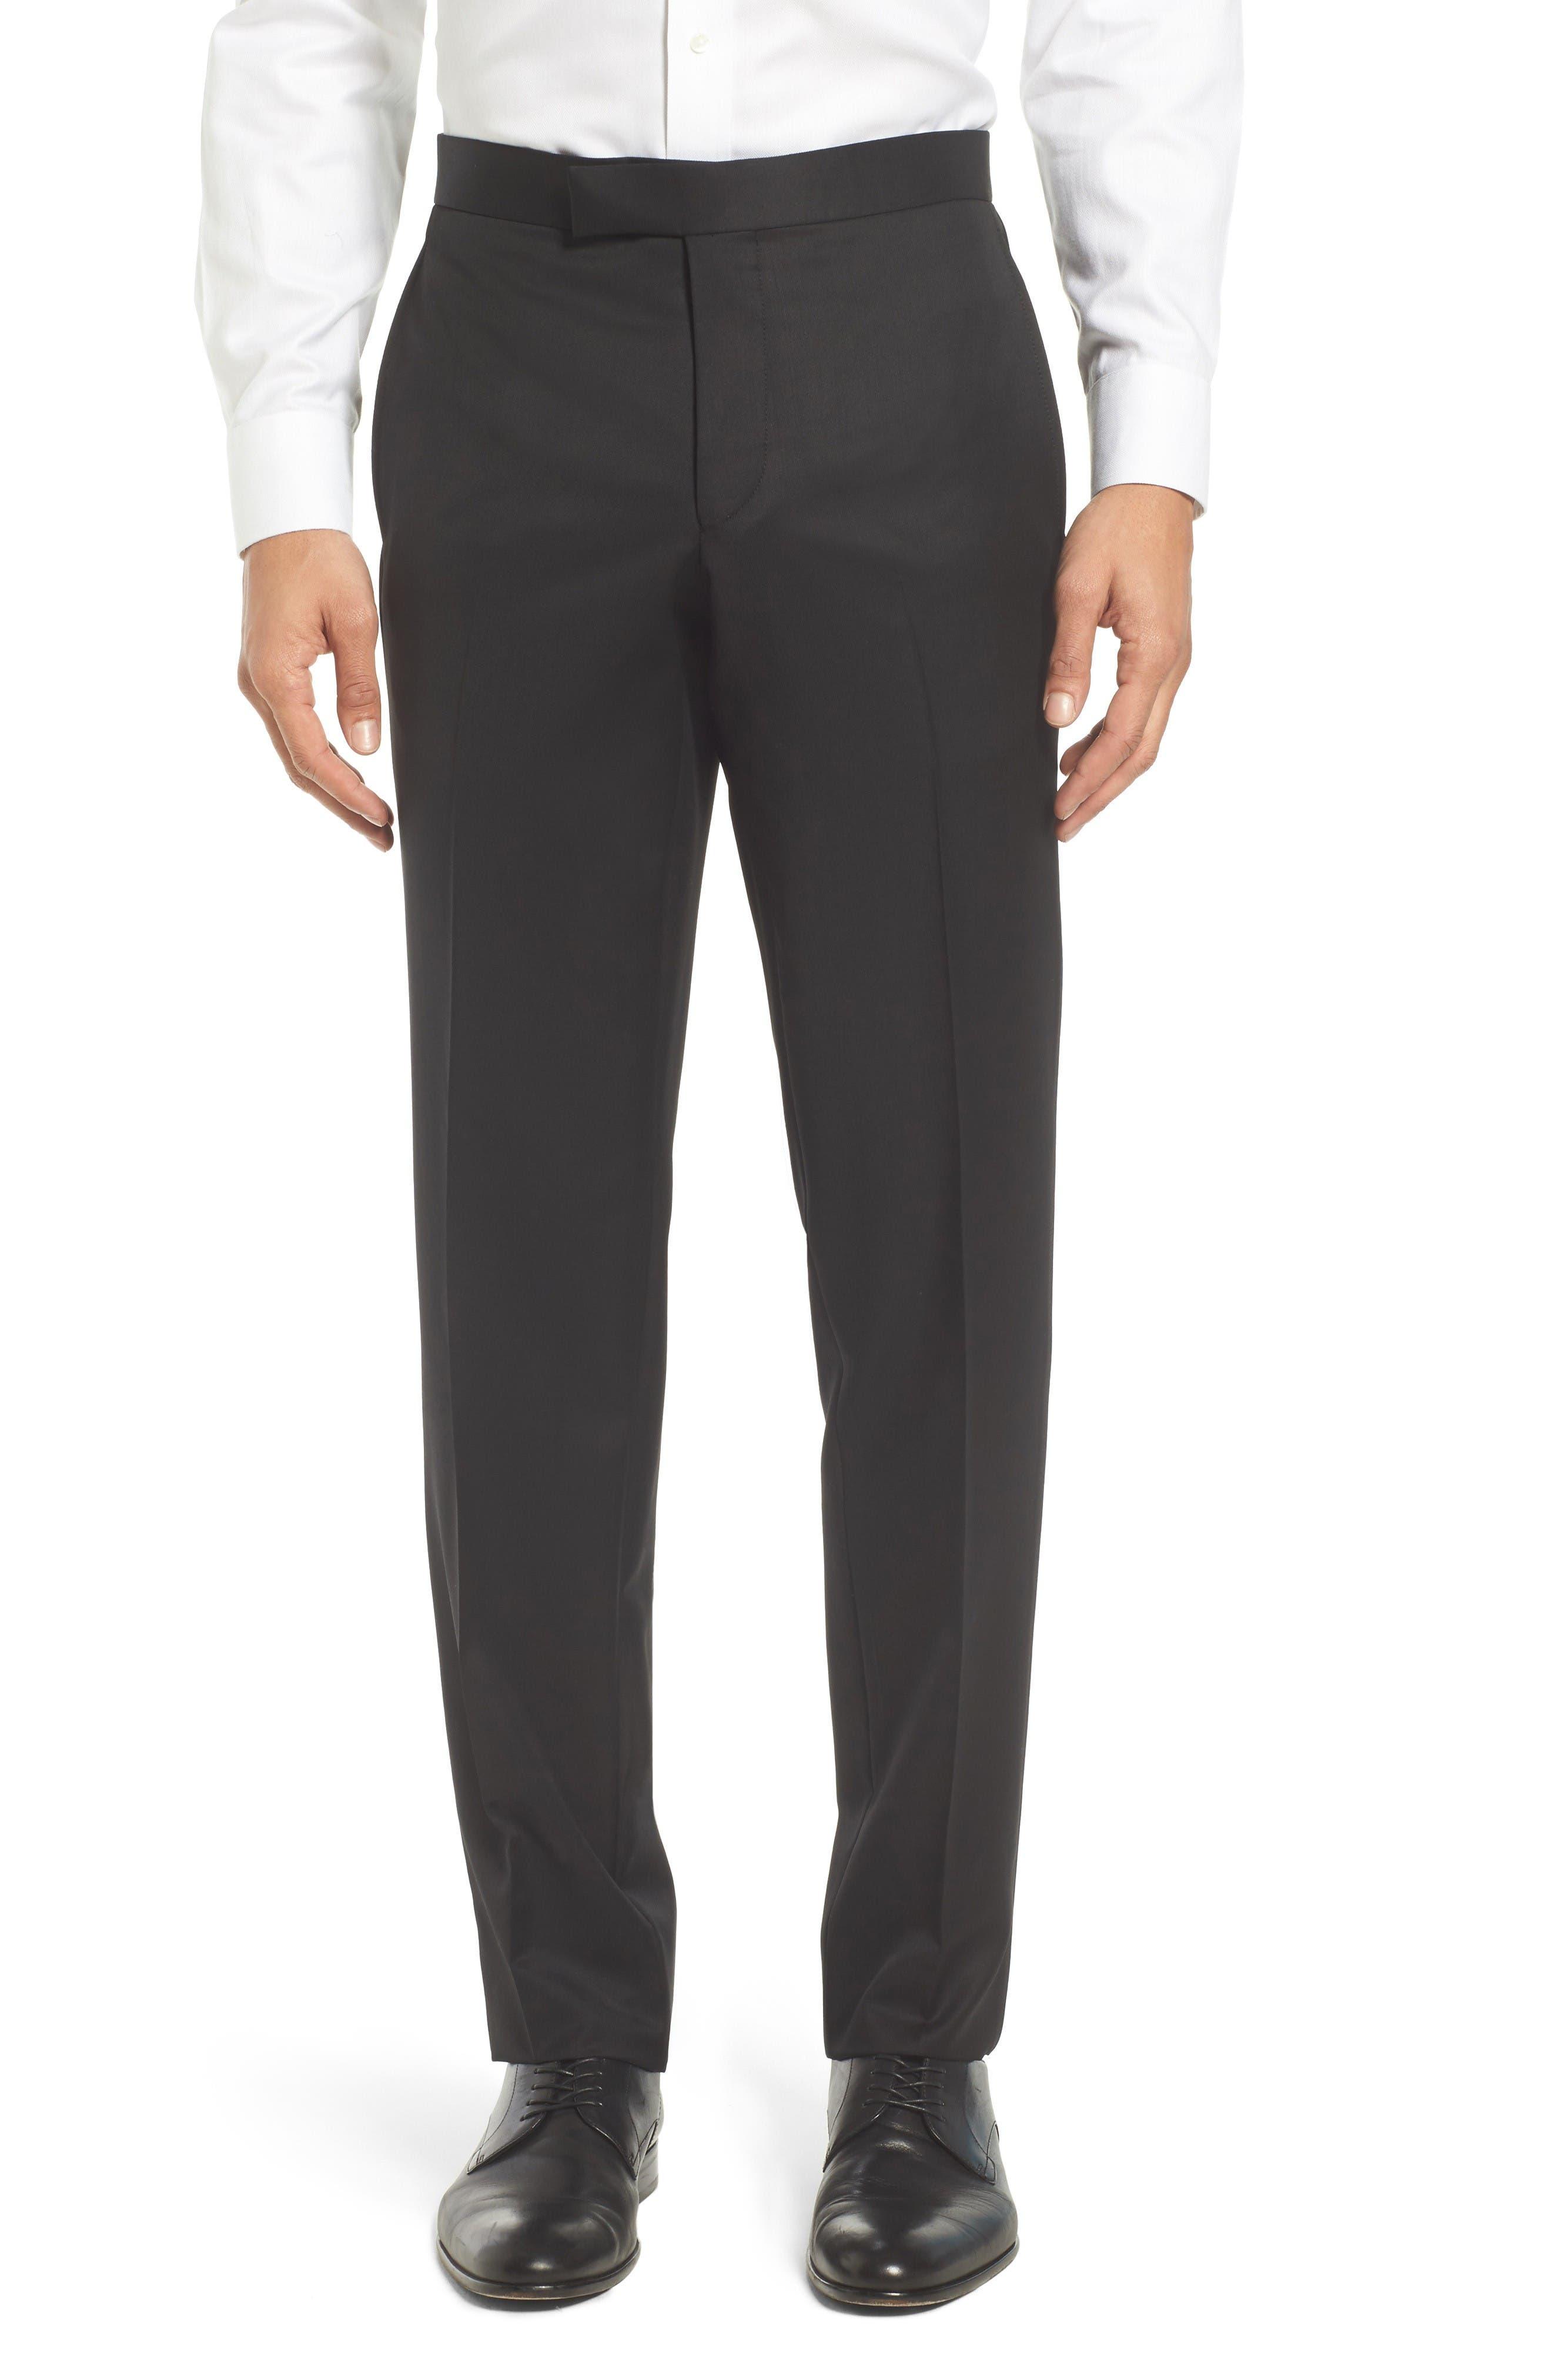 Josh Flat Front Wool & Mohair Tuxedo Pants,                         Main,                         color, Black